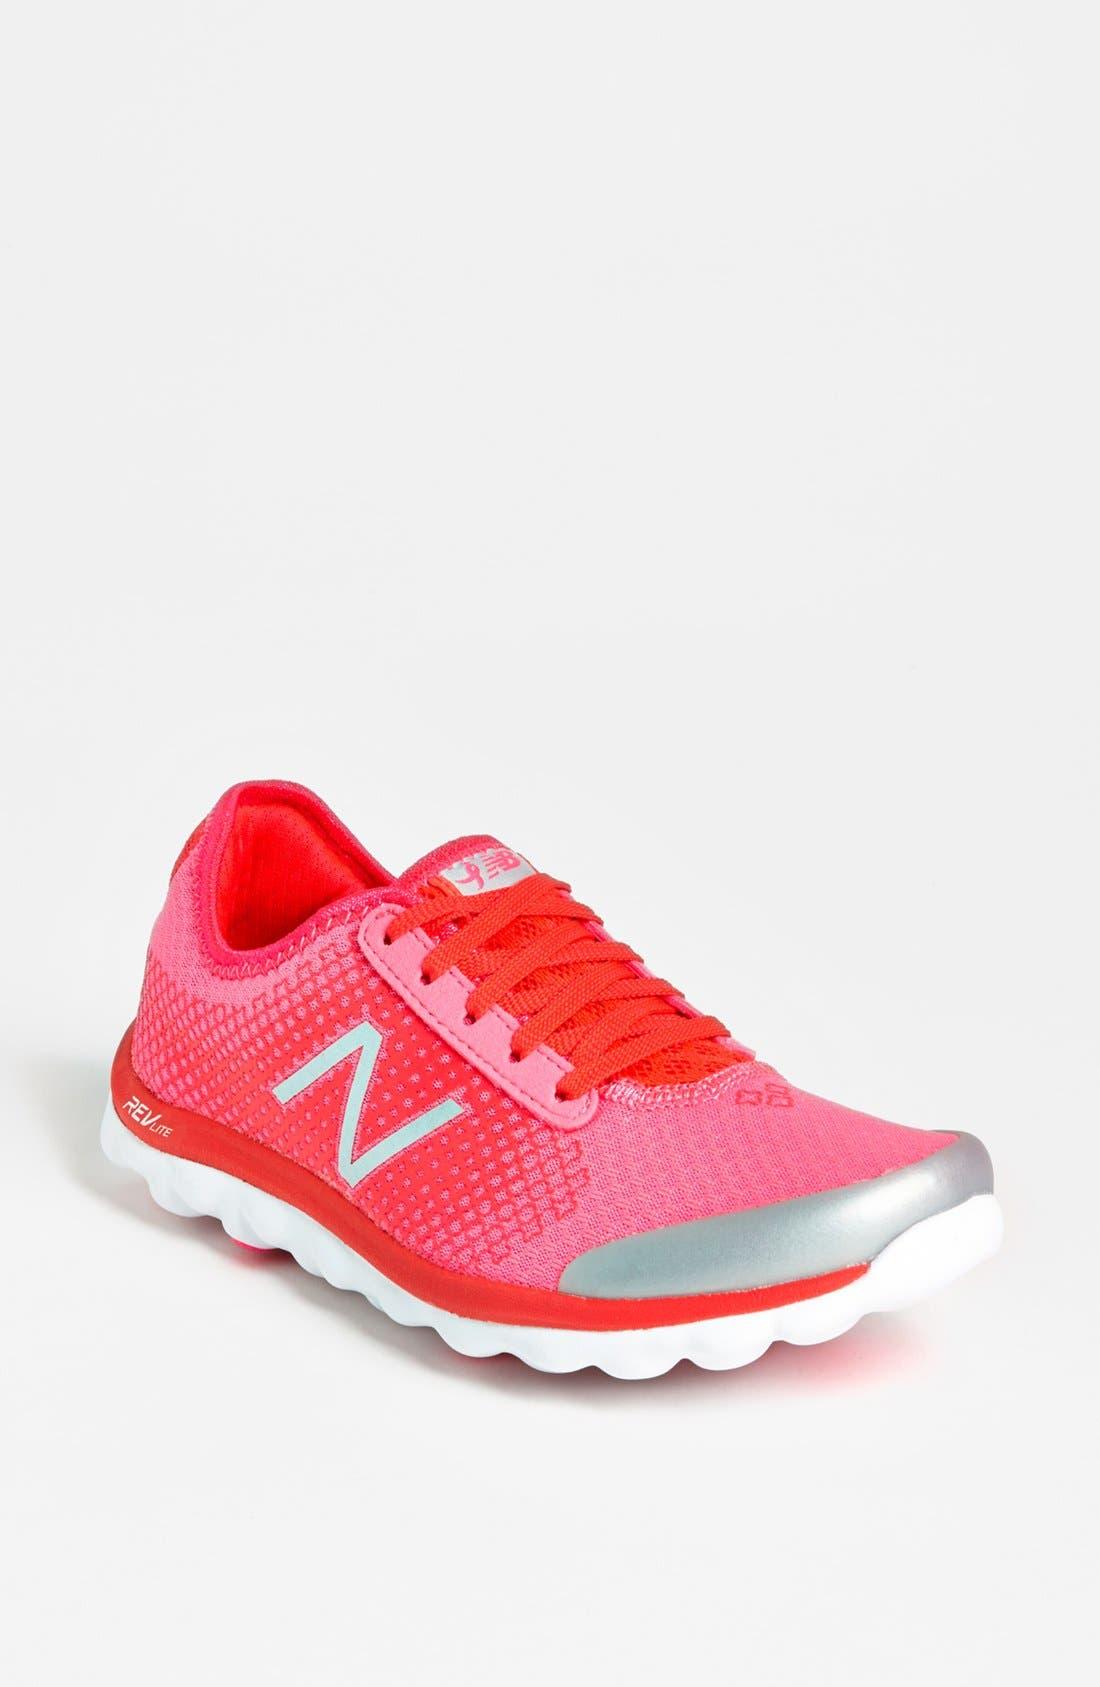 Alternate Image 1 Selected - New Balance '1400' Running Shoe (Women)